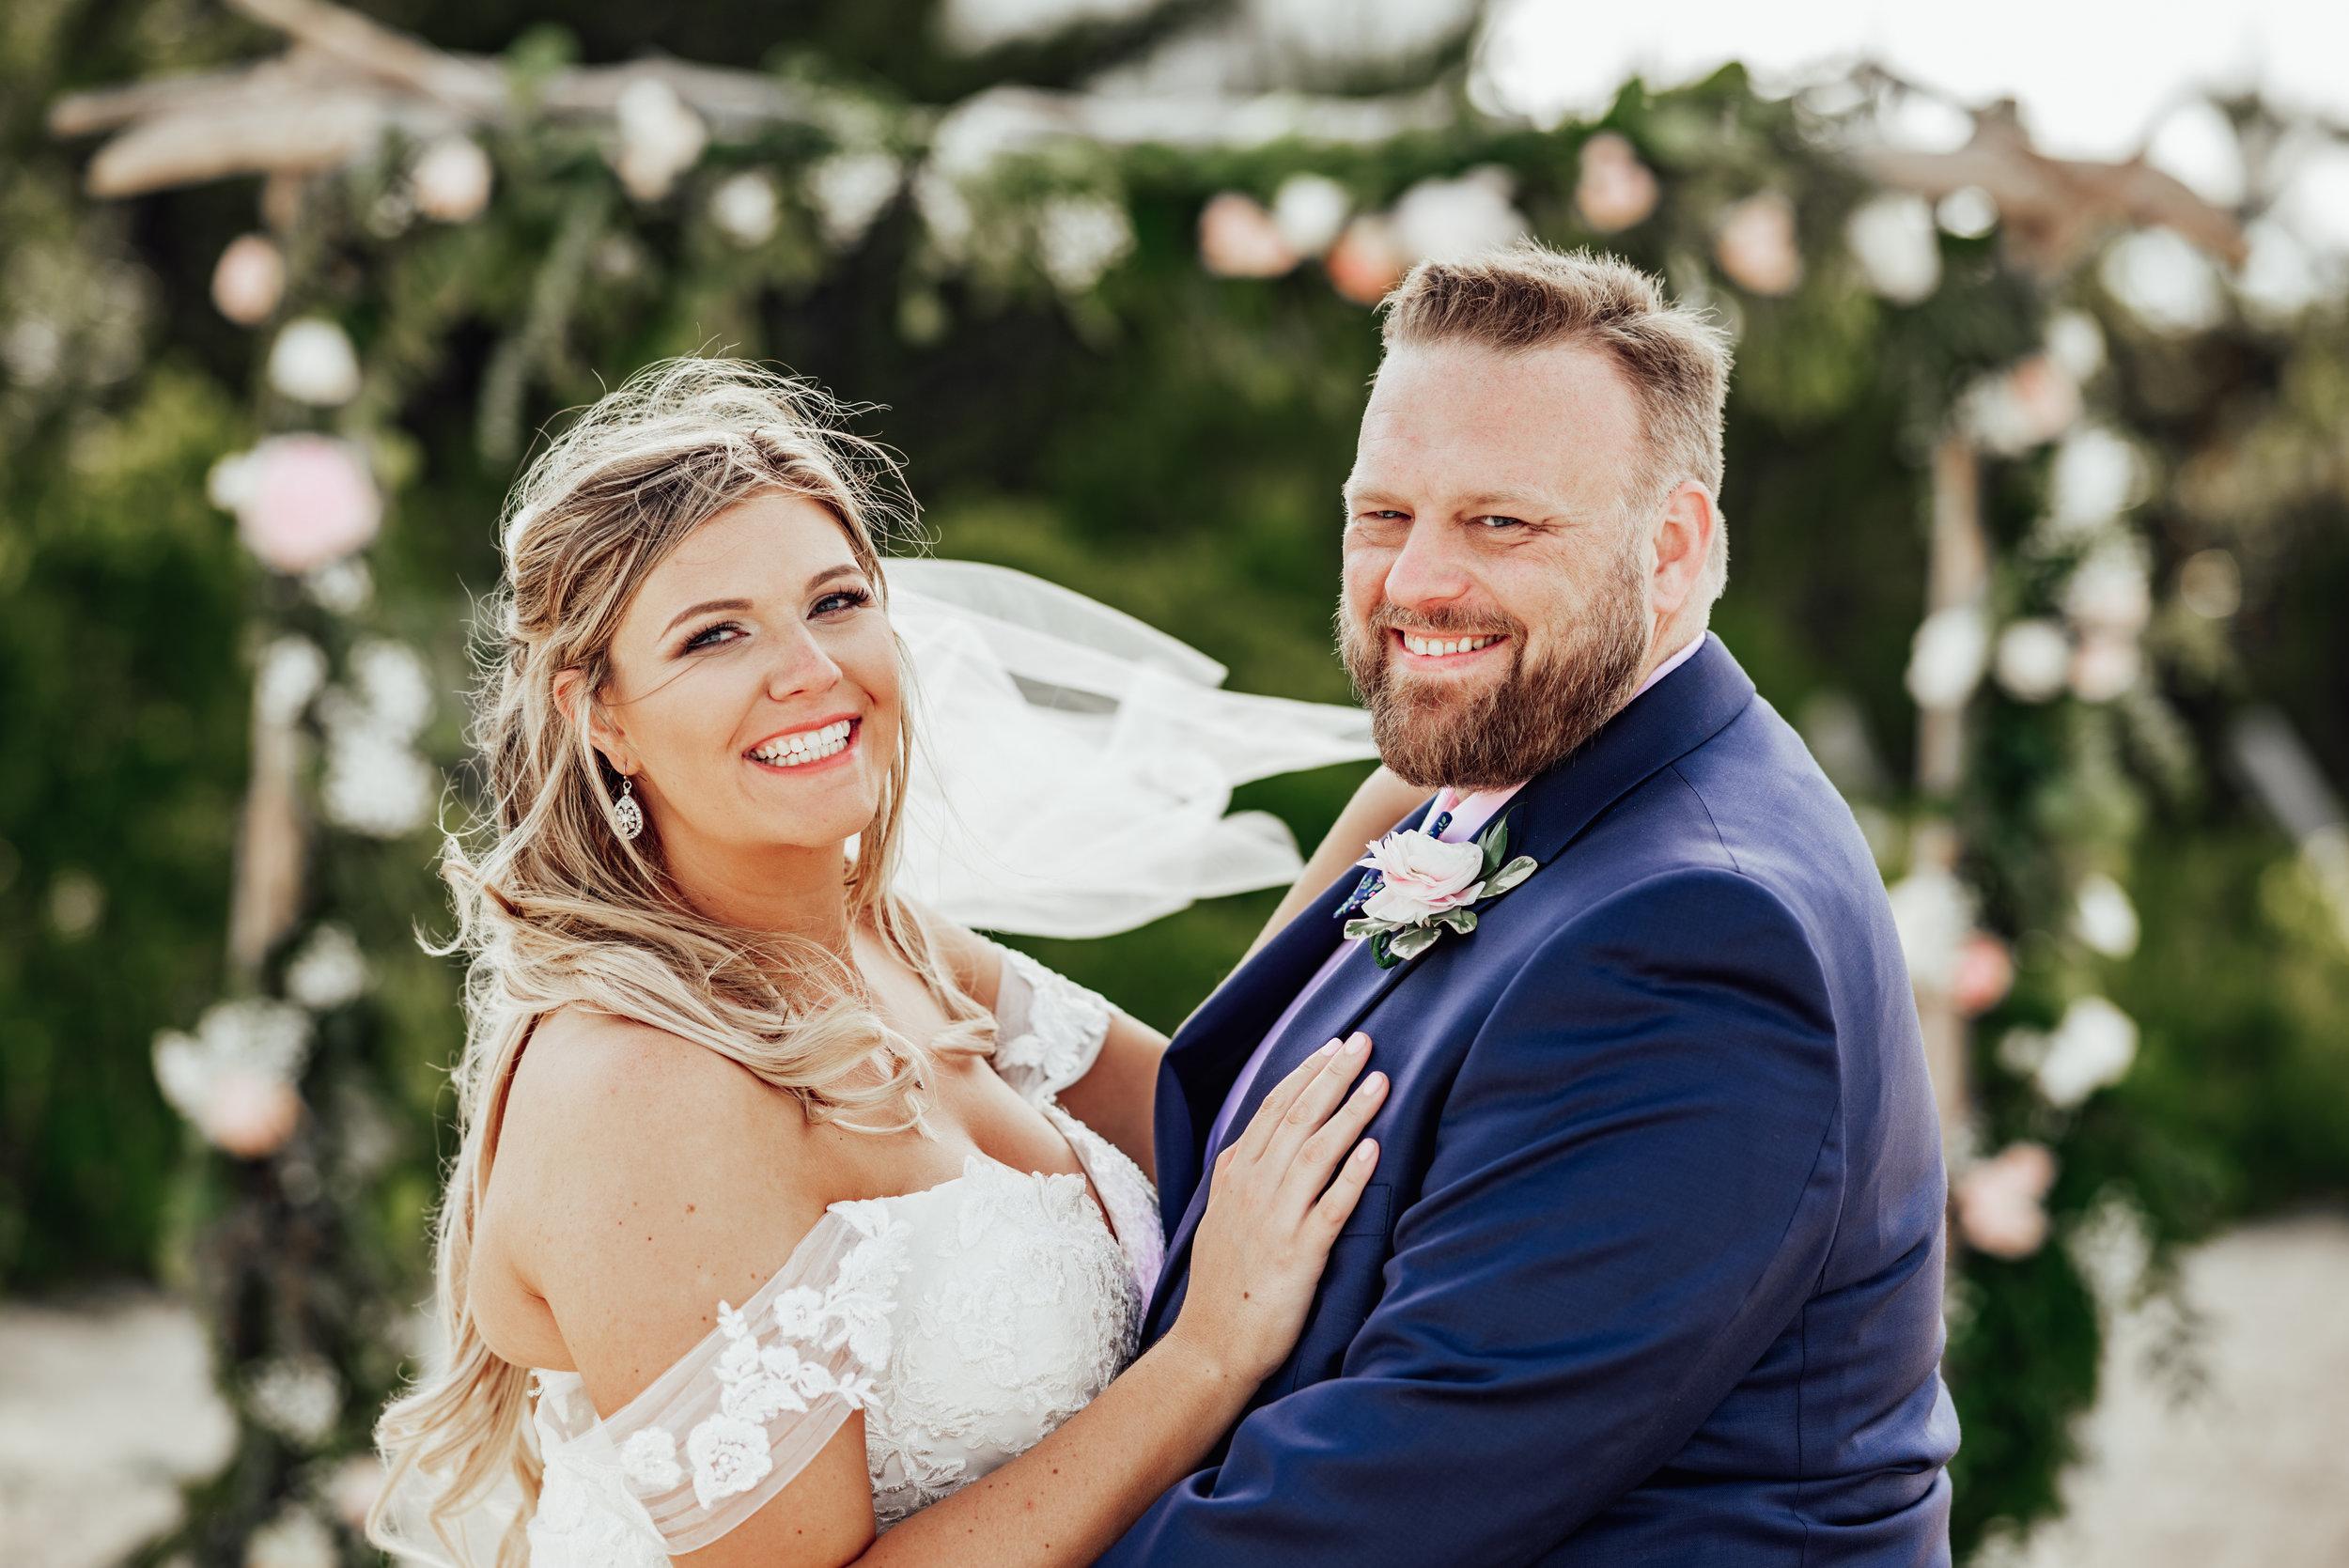 New Jersey Wedding Photographer, Felsberg Photography LBI wedding photography 83.jpg